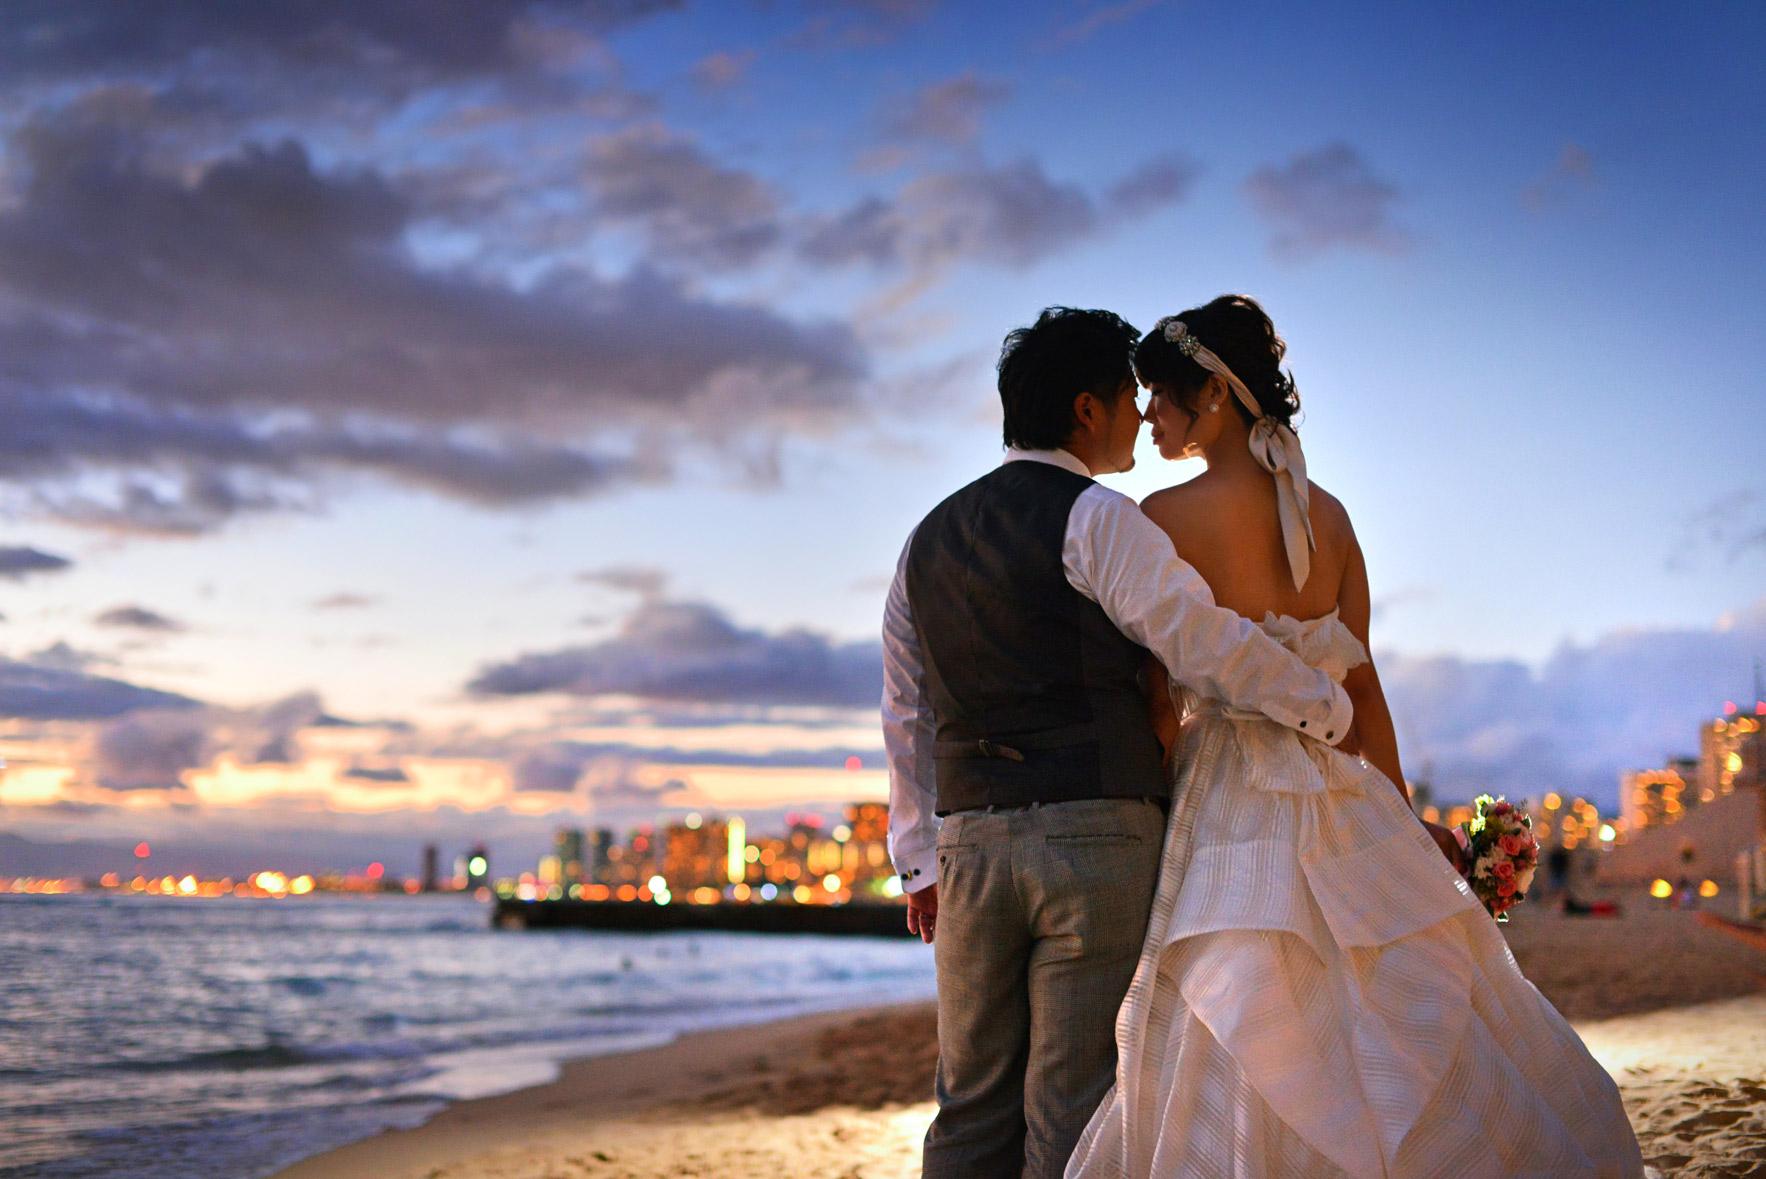 waikiki-beach-wedding-and-downtown-honolulu-hawaii-theater-stephen-ludwig-photography165.jpg